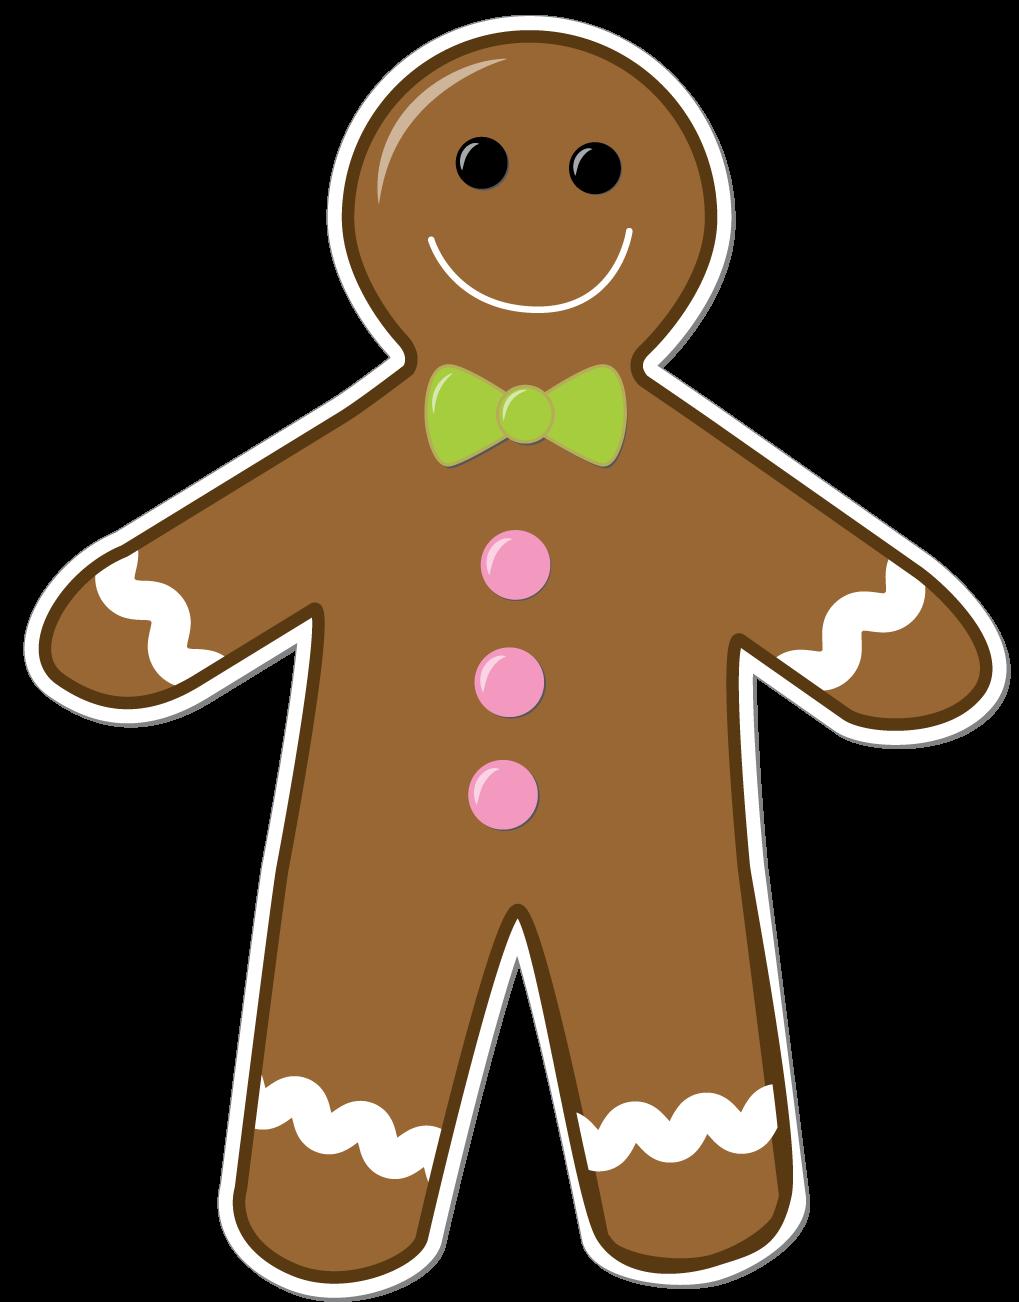 Christmas gingerbread clipart svg transparent stock 28+ Collection of Christmas Gingerbread Man Clipart | High quality ... svg transparent stock